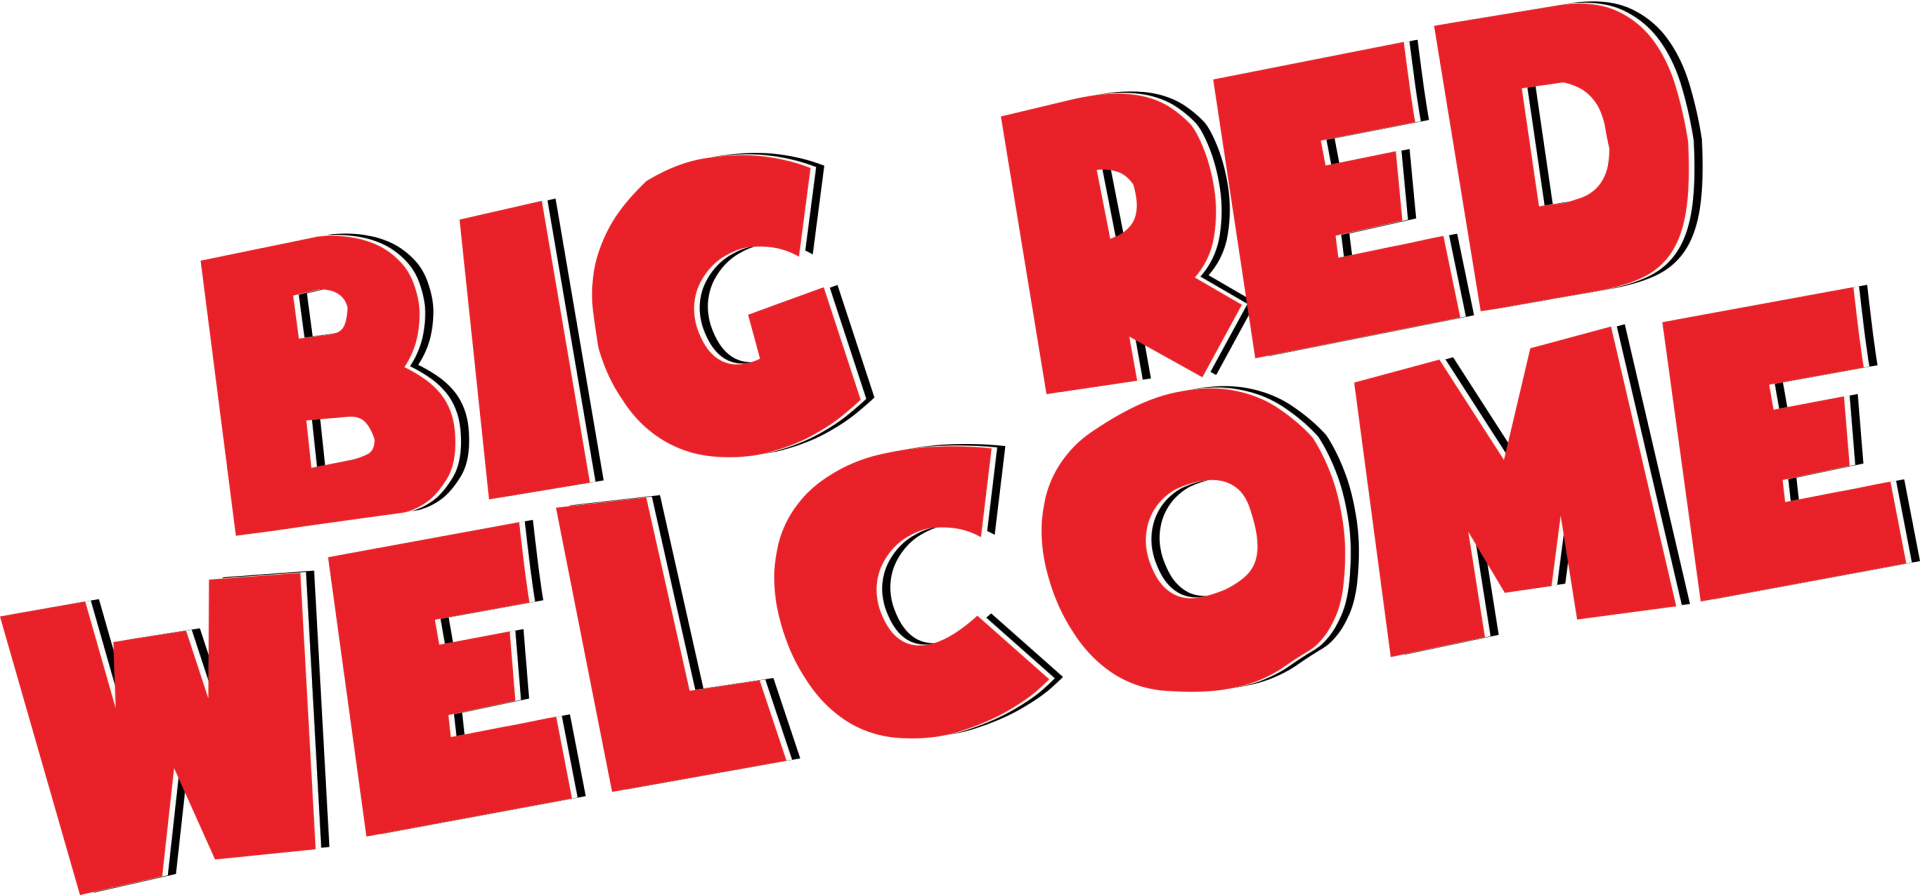 Husker football clipart banner library stock UNL Big Red Welcome | Nebraska banner library stock